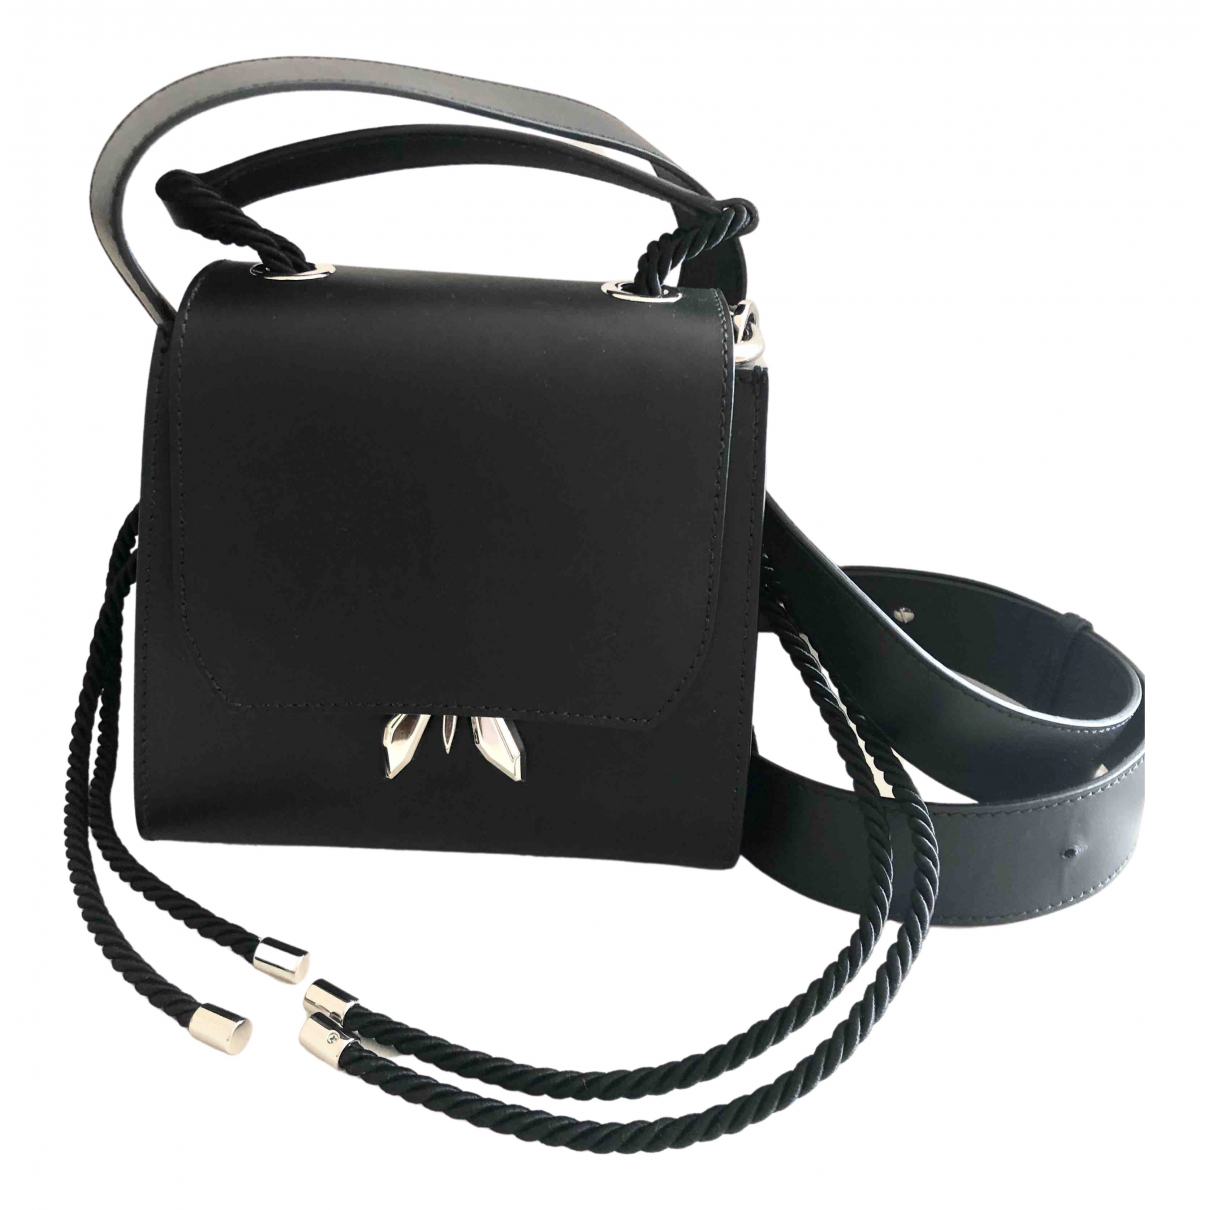 Patrizia Pepe \N Black Leather handbag for Women \N